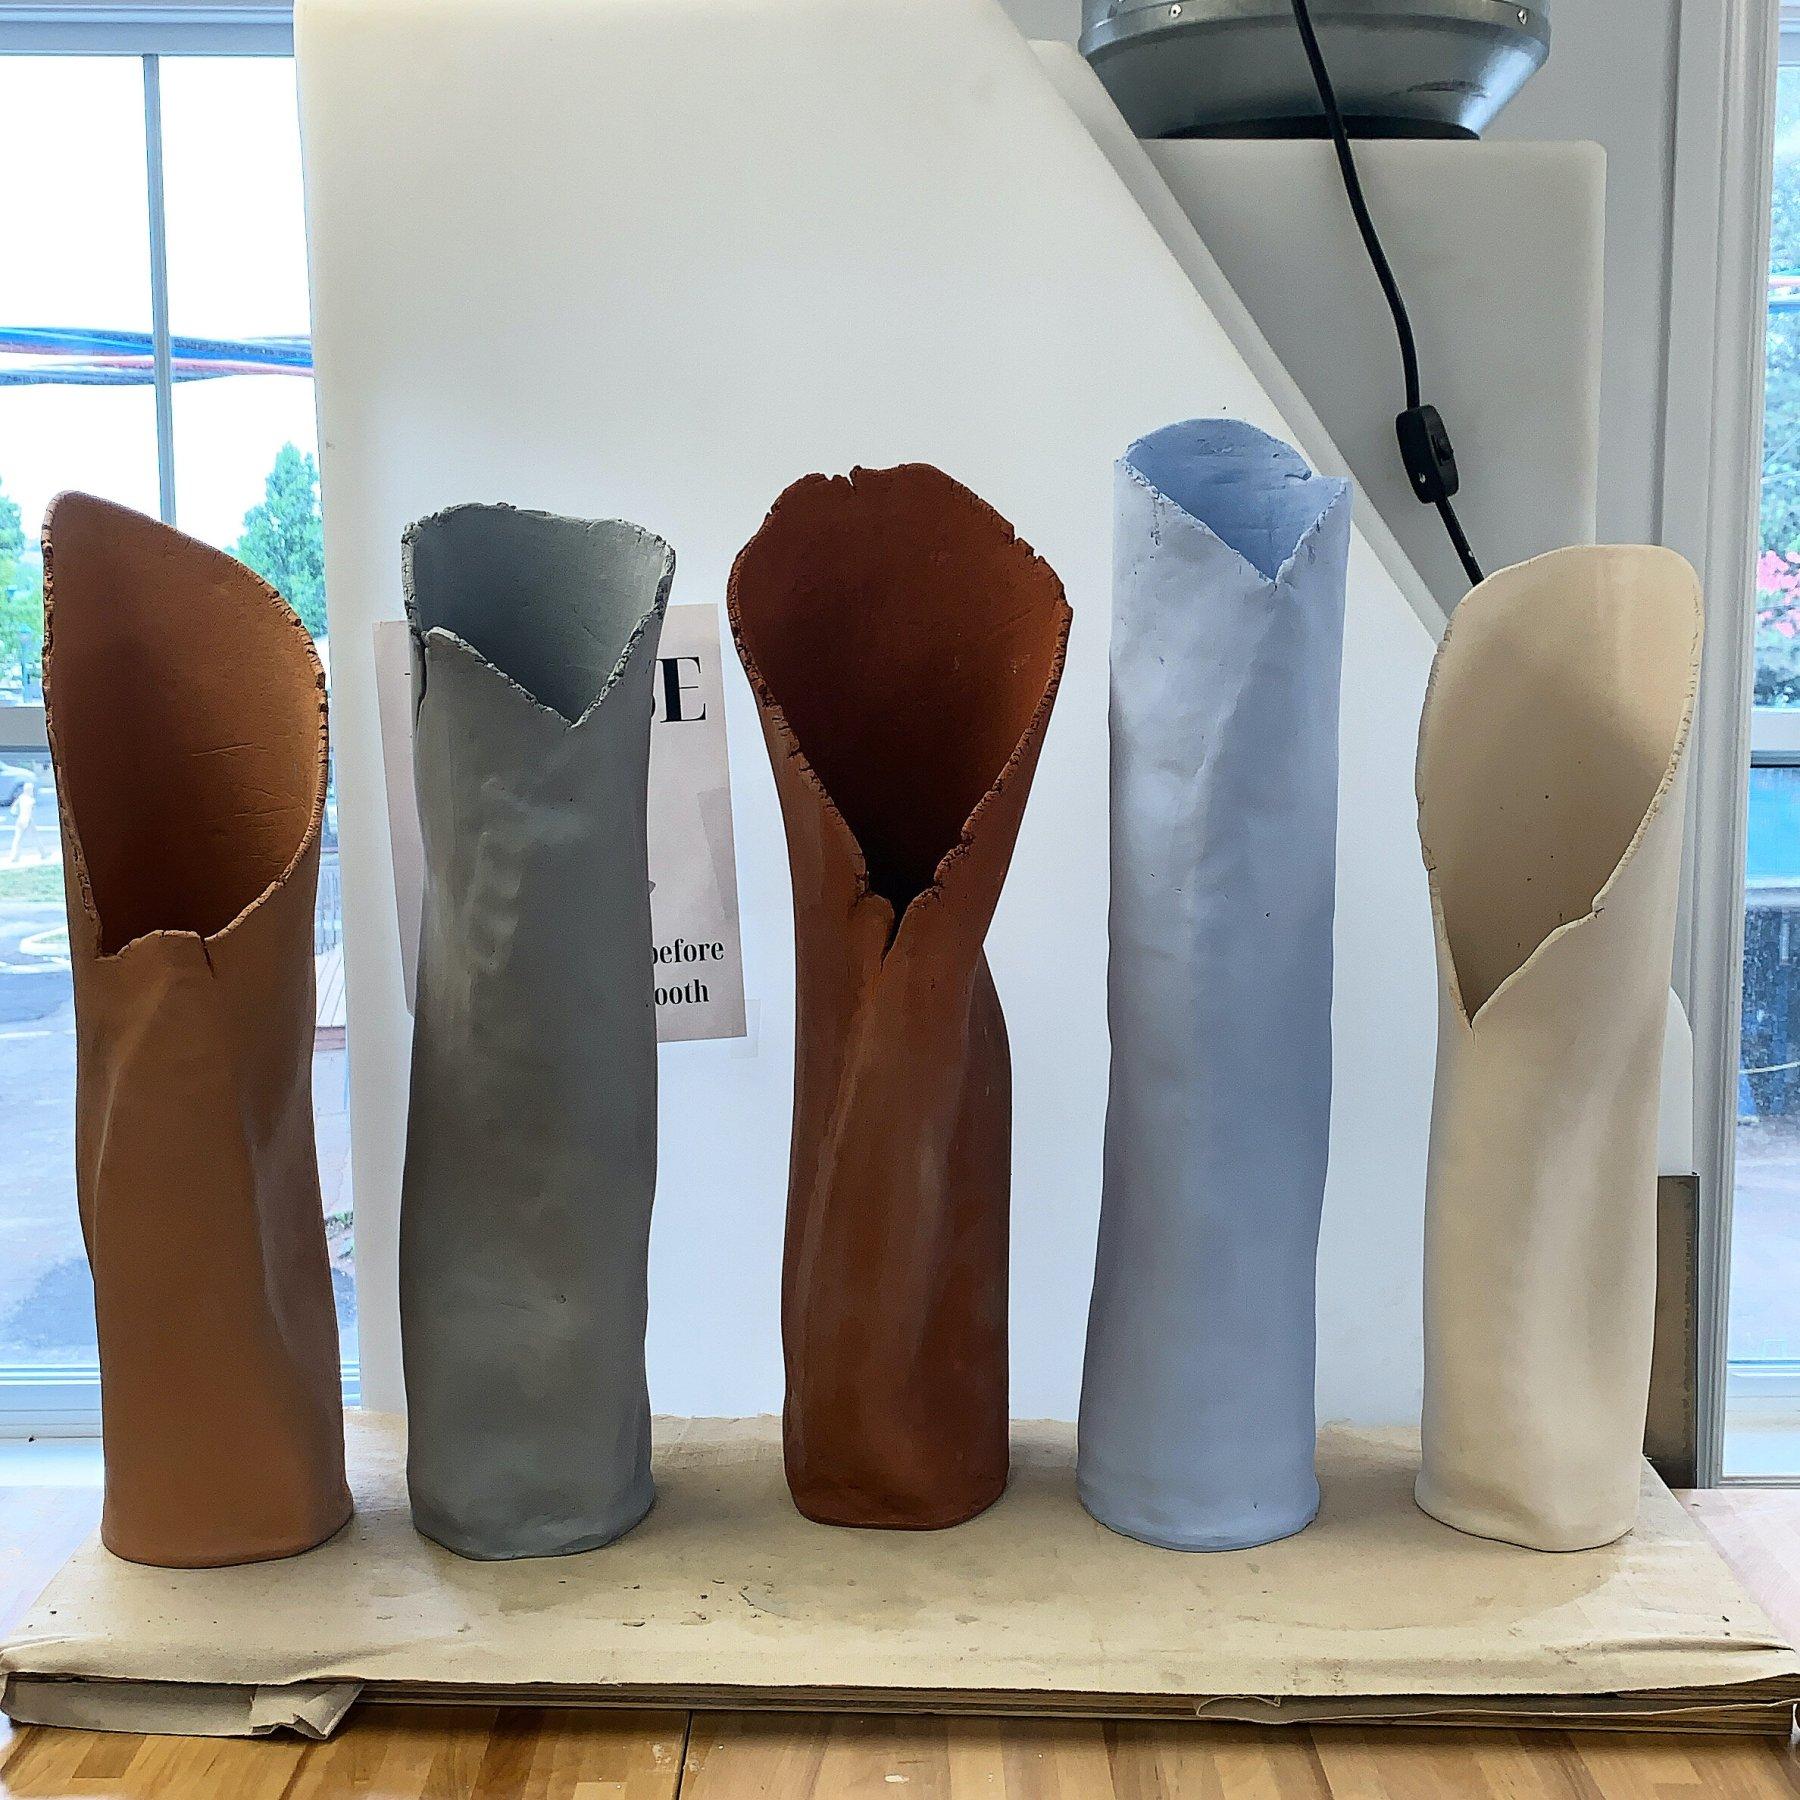 Matt Cripps' 5 Crackling Vases before the Miramichi piece slumped over.